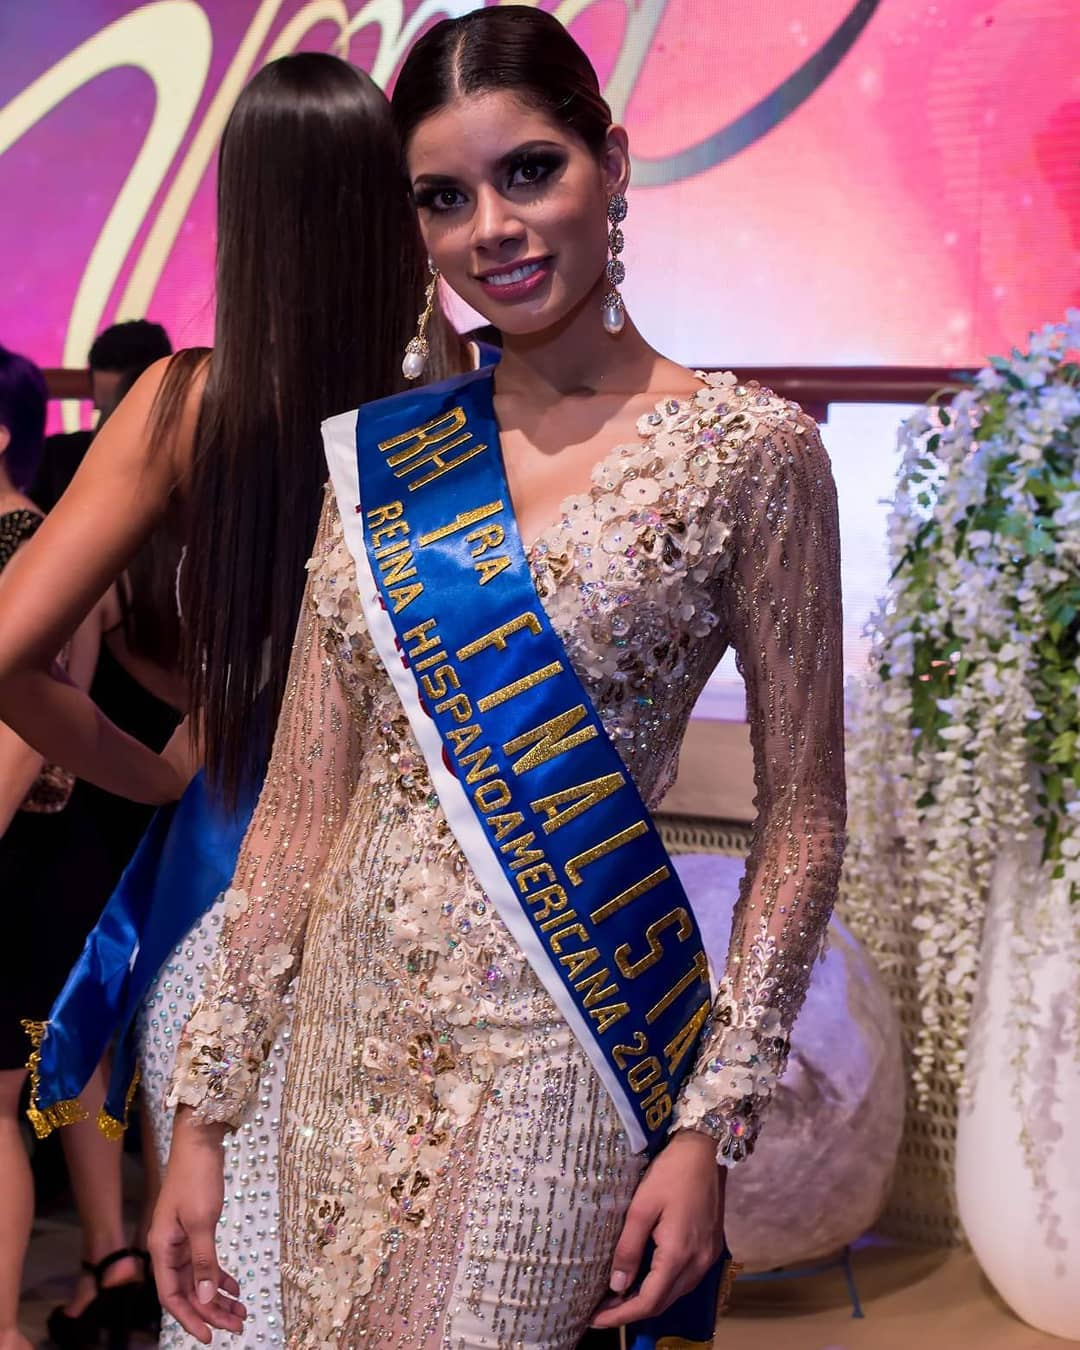 aranza molina, 1 finalista de reyna hispanoamericana 2018. - Página 9 43766411